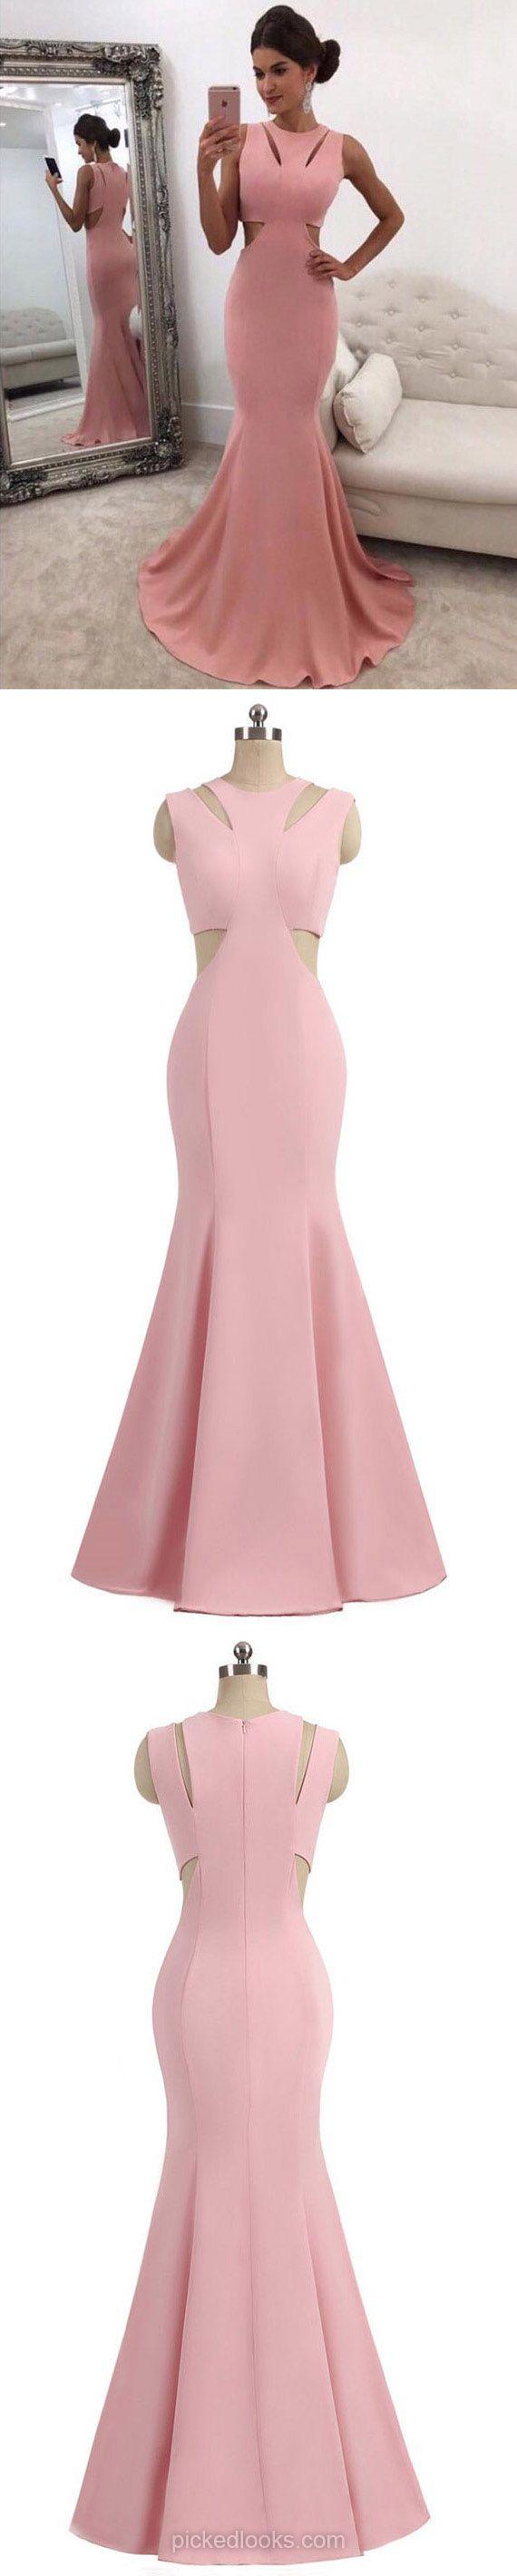 Long ball dresses pink silklike prom dresses mermaid evening